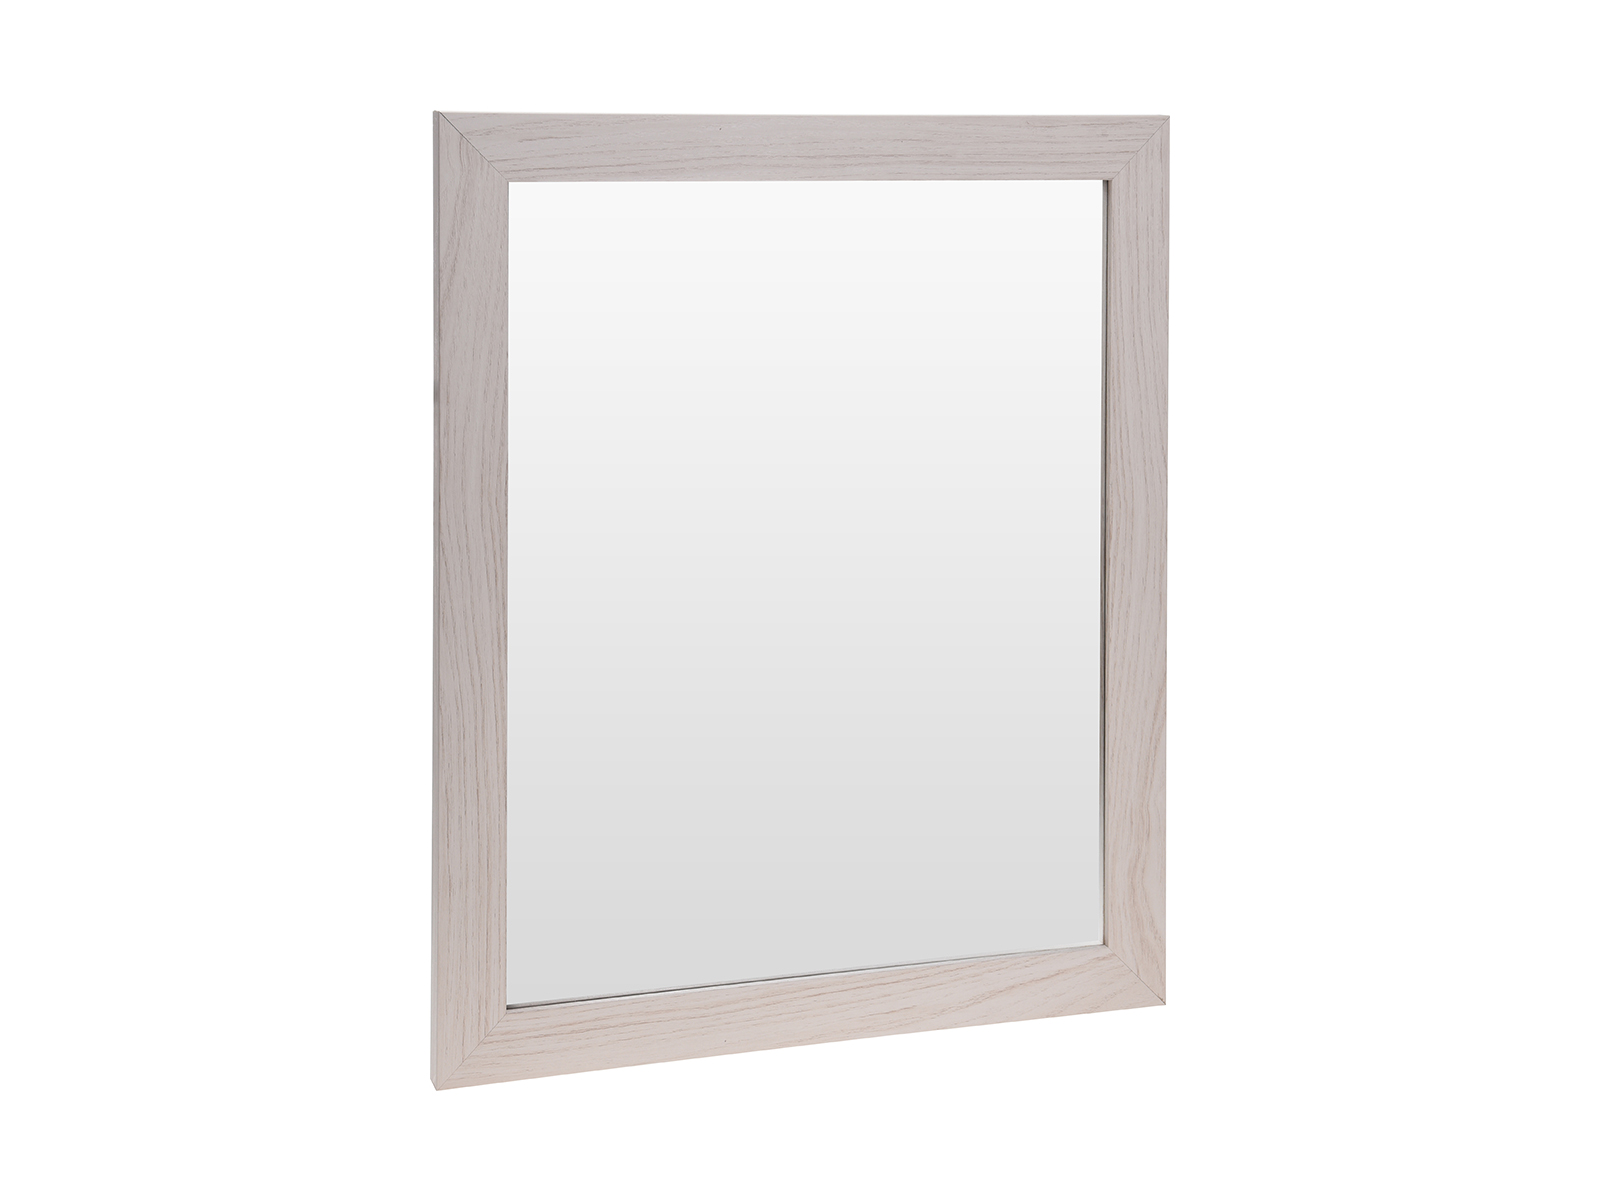 Зеркало OlsenЗеркала<br>Зеркало декоративное<br>